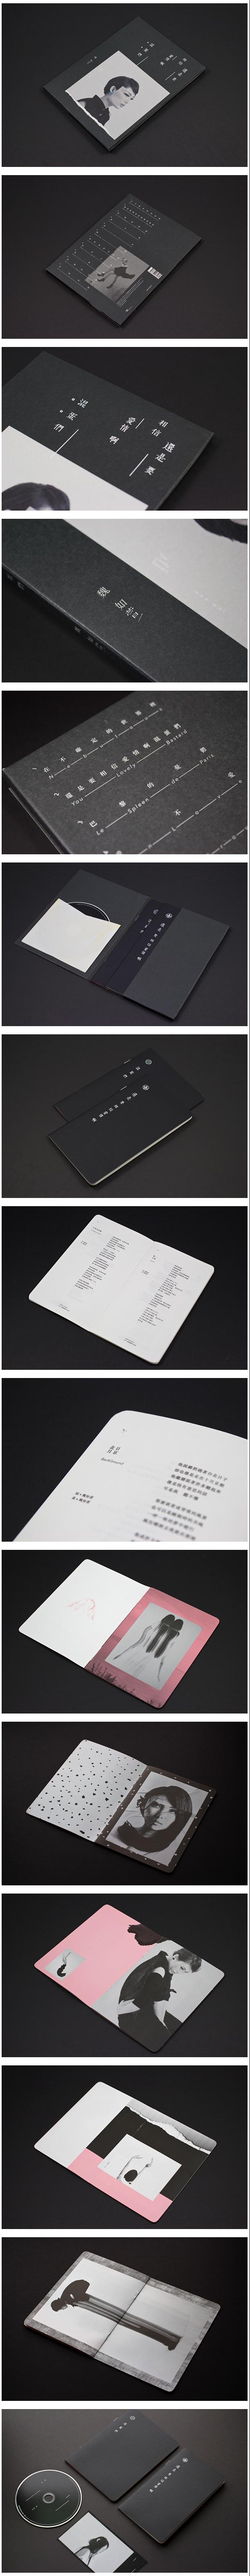 so sexy urghhh album packaging design for taiwanese female rh pinterest com